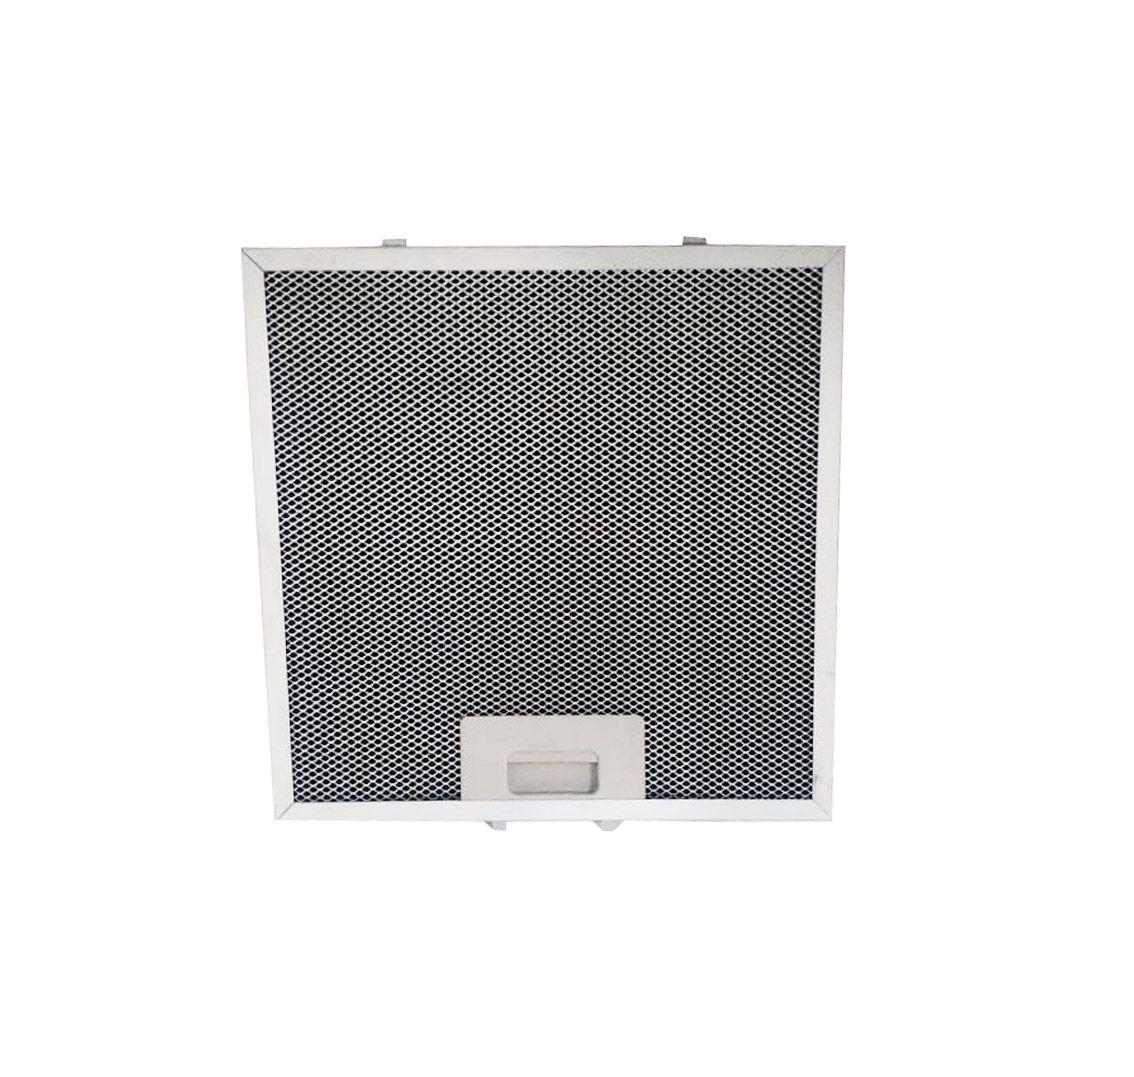 Filtro Metálico Coifa Cadence Tradizionale Cfa290 original